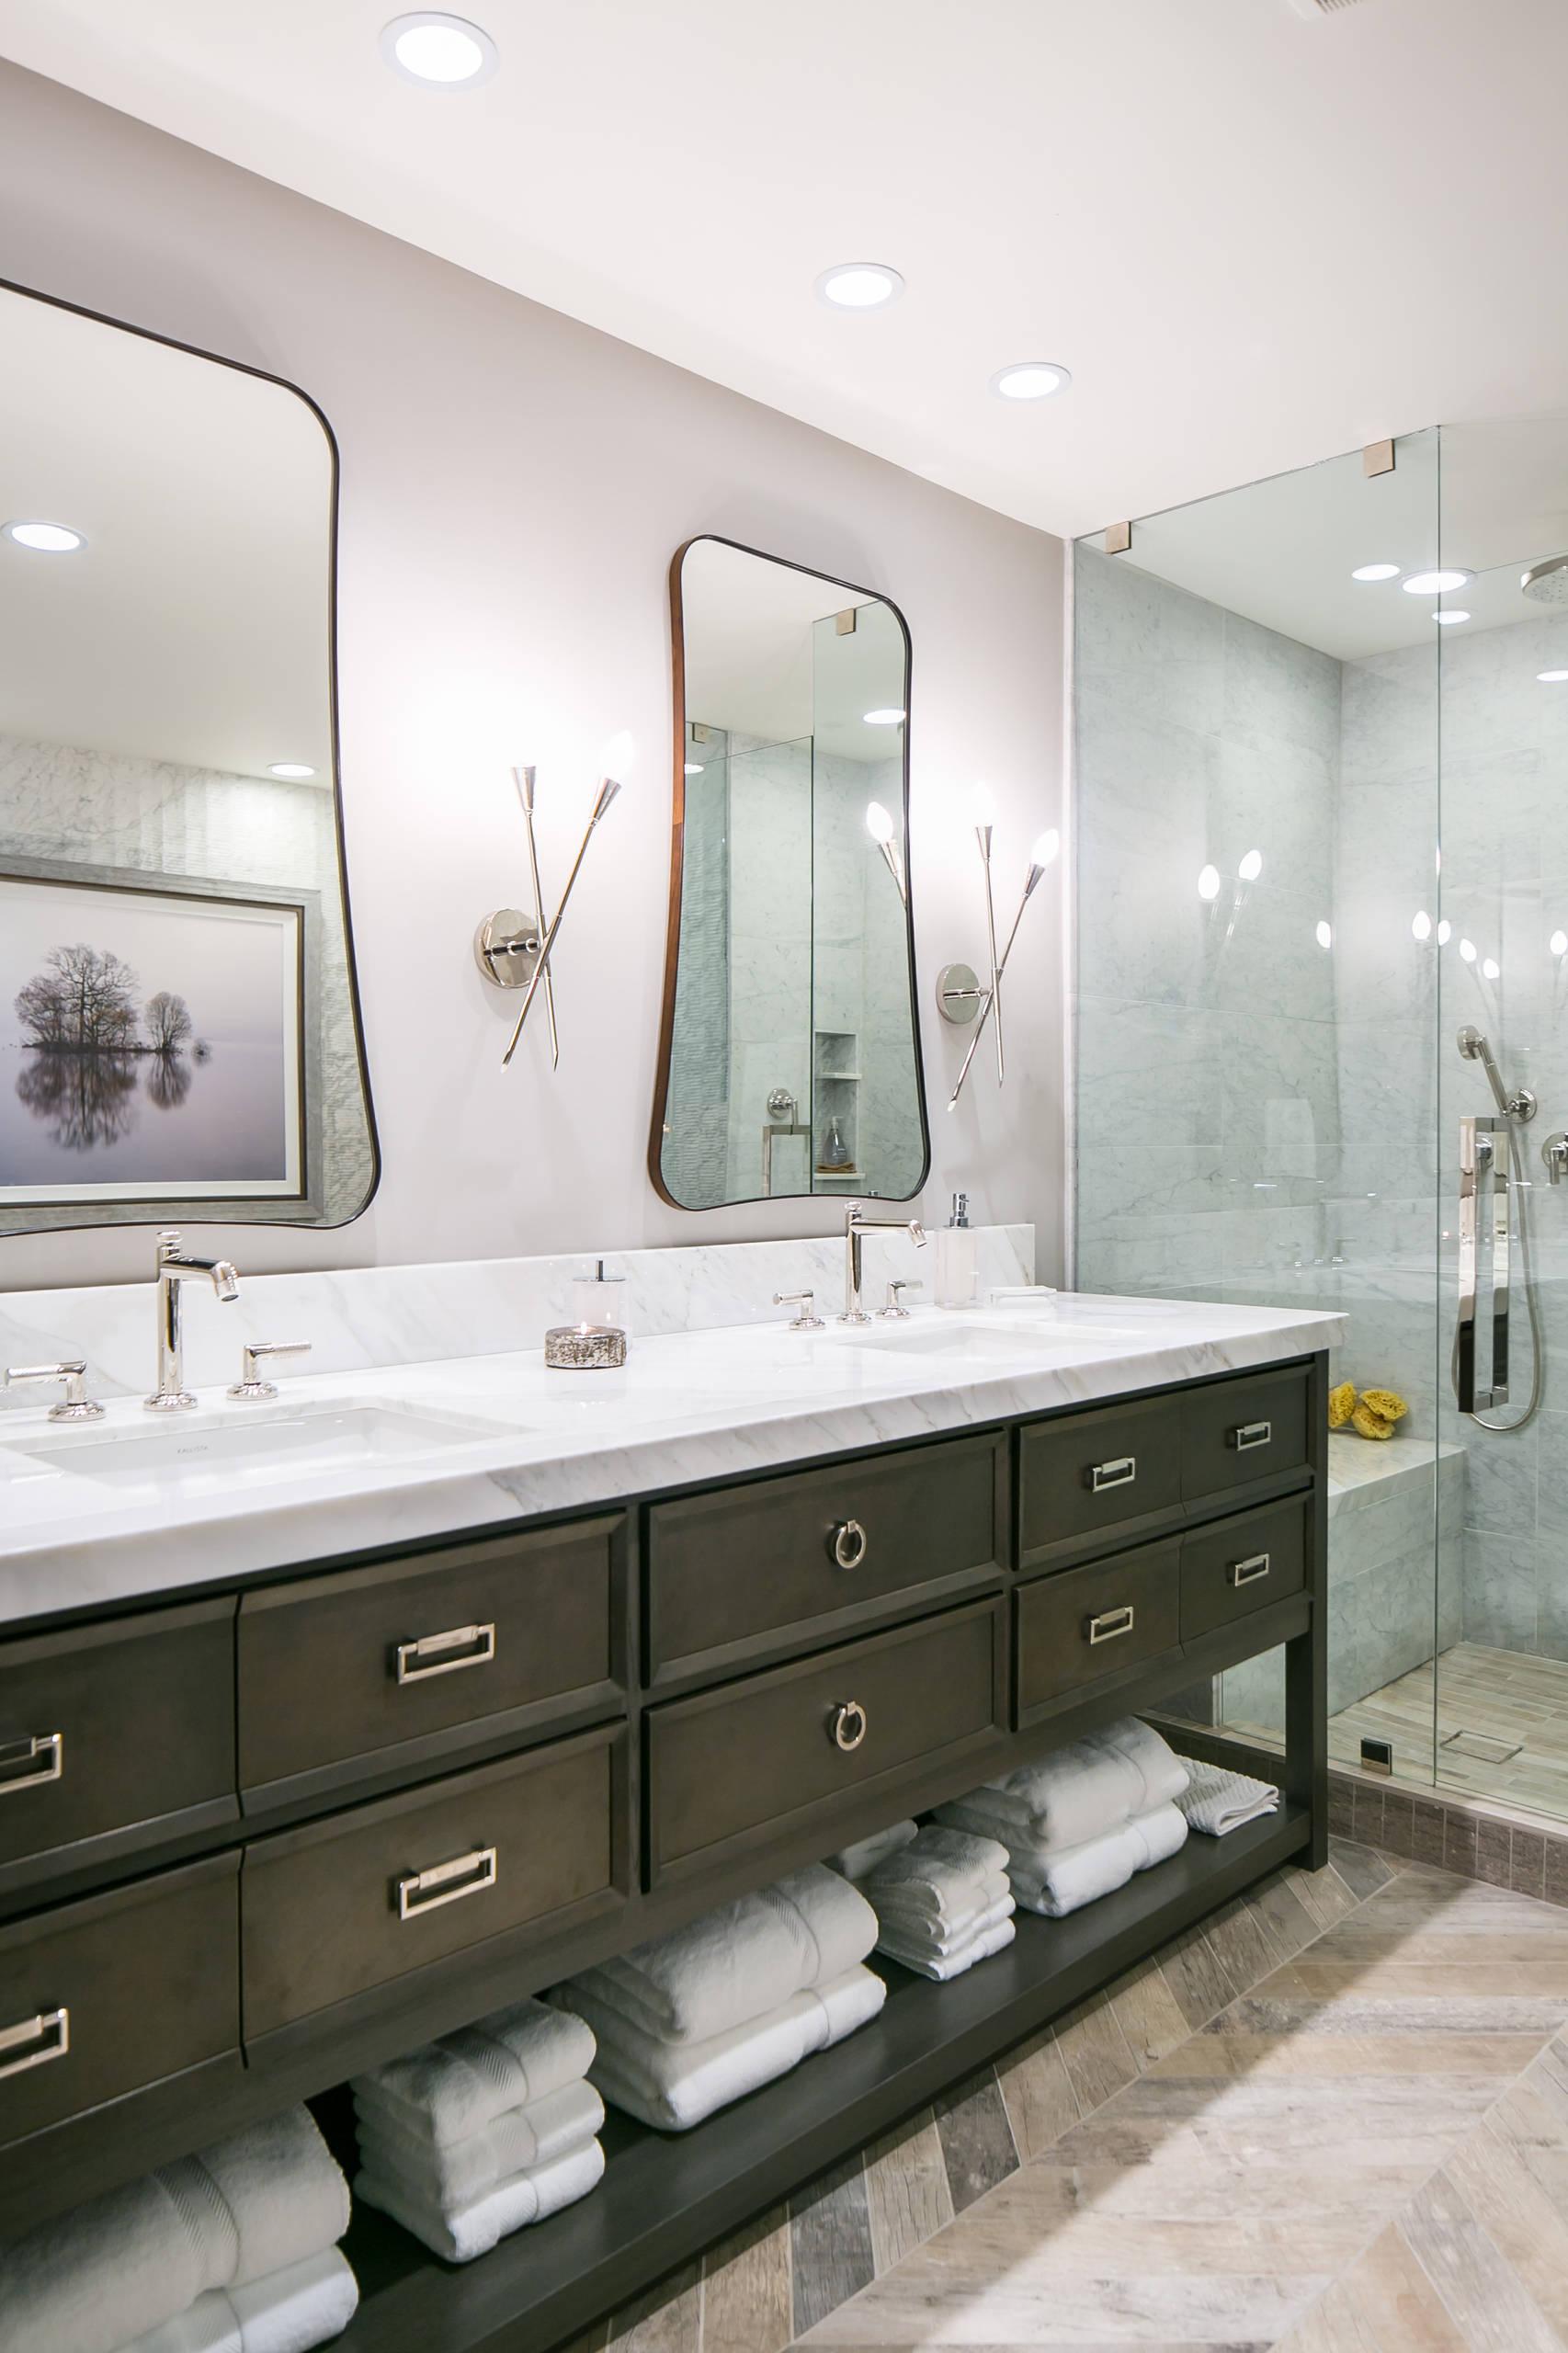 Denver Colorado Residence Loft Style BATHROOM